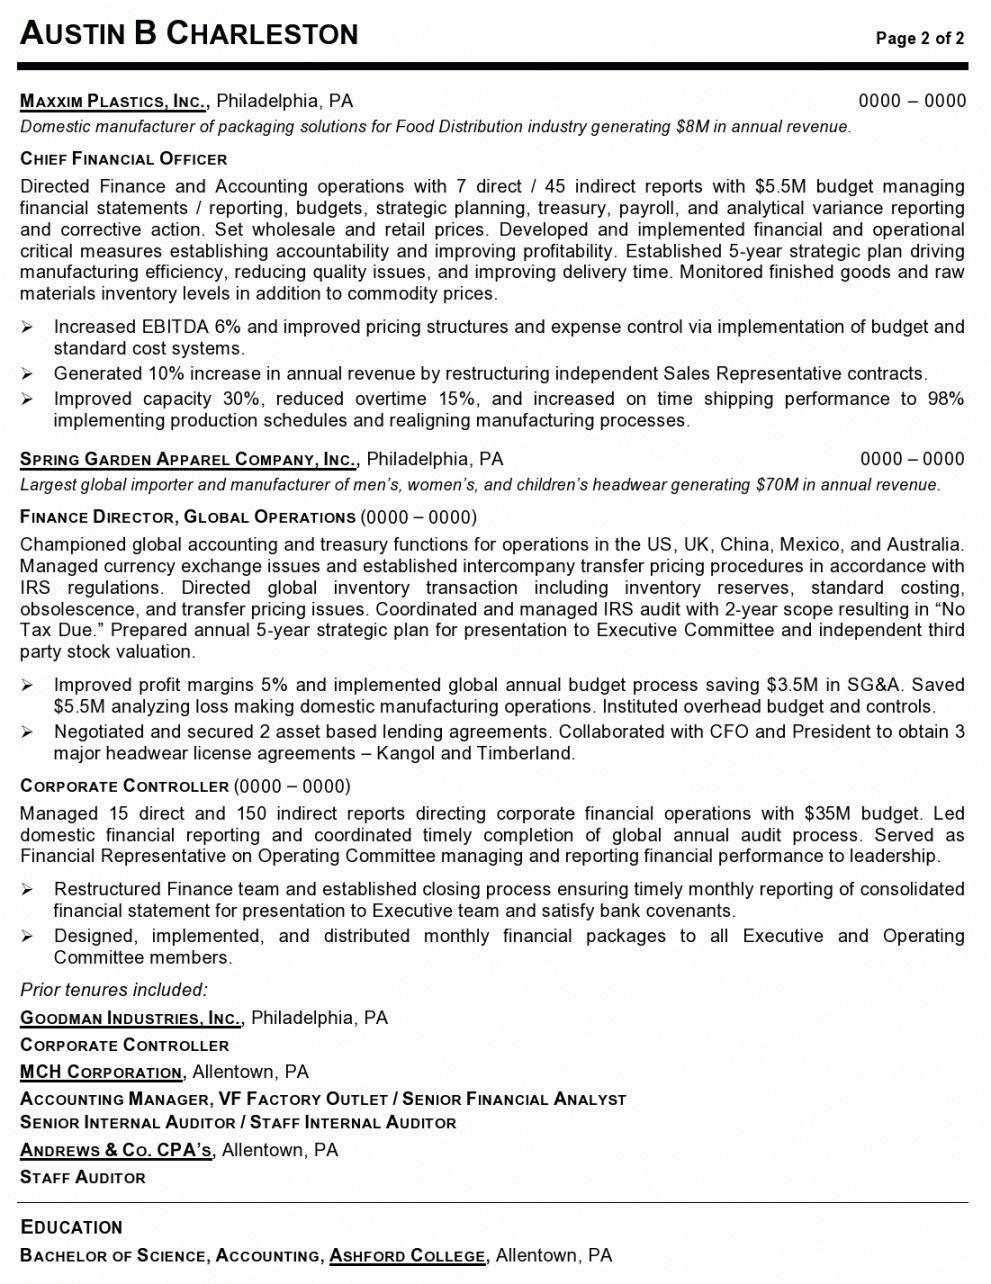 Explore Our Example Of Vice President Of Operations Job Description Template Job Description Template Resume Examples Job Description